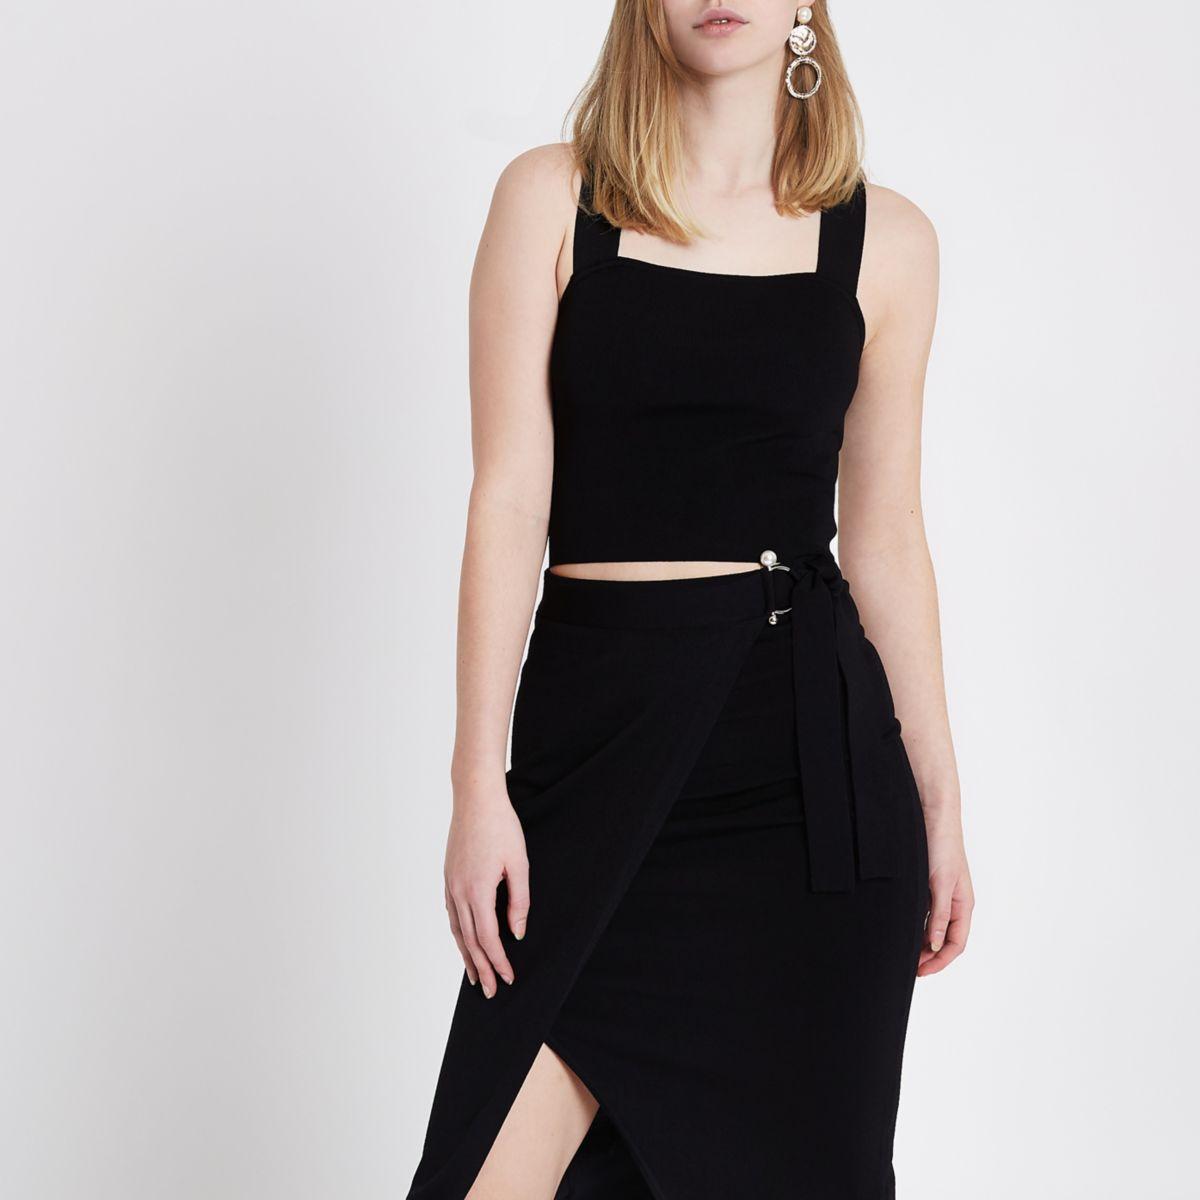 Black knit strappy faux pearl back crop top